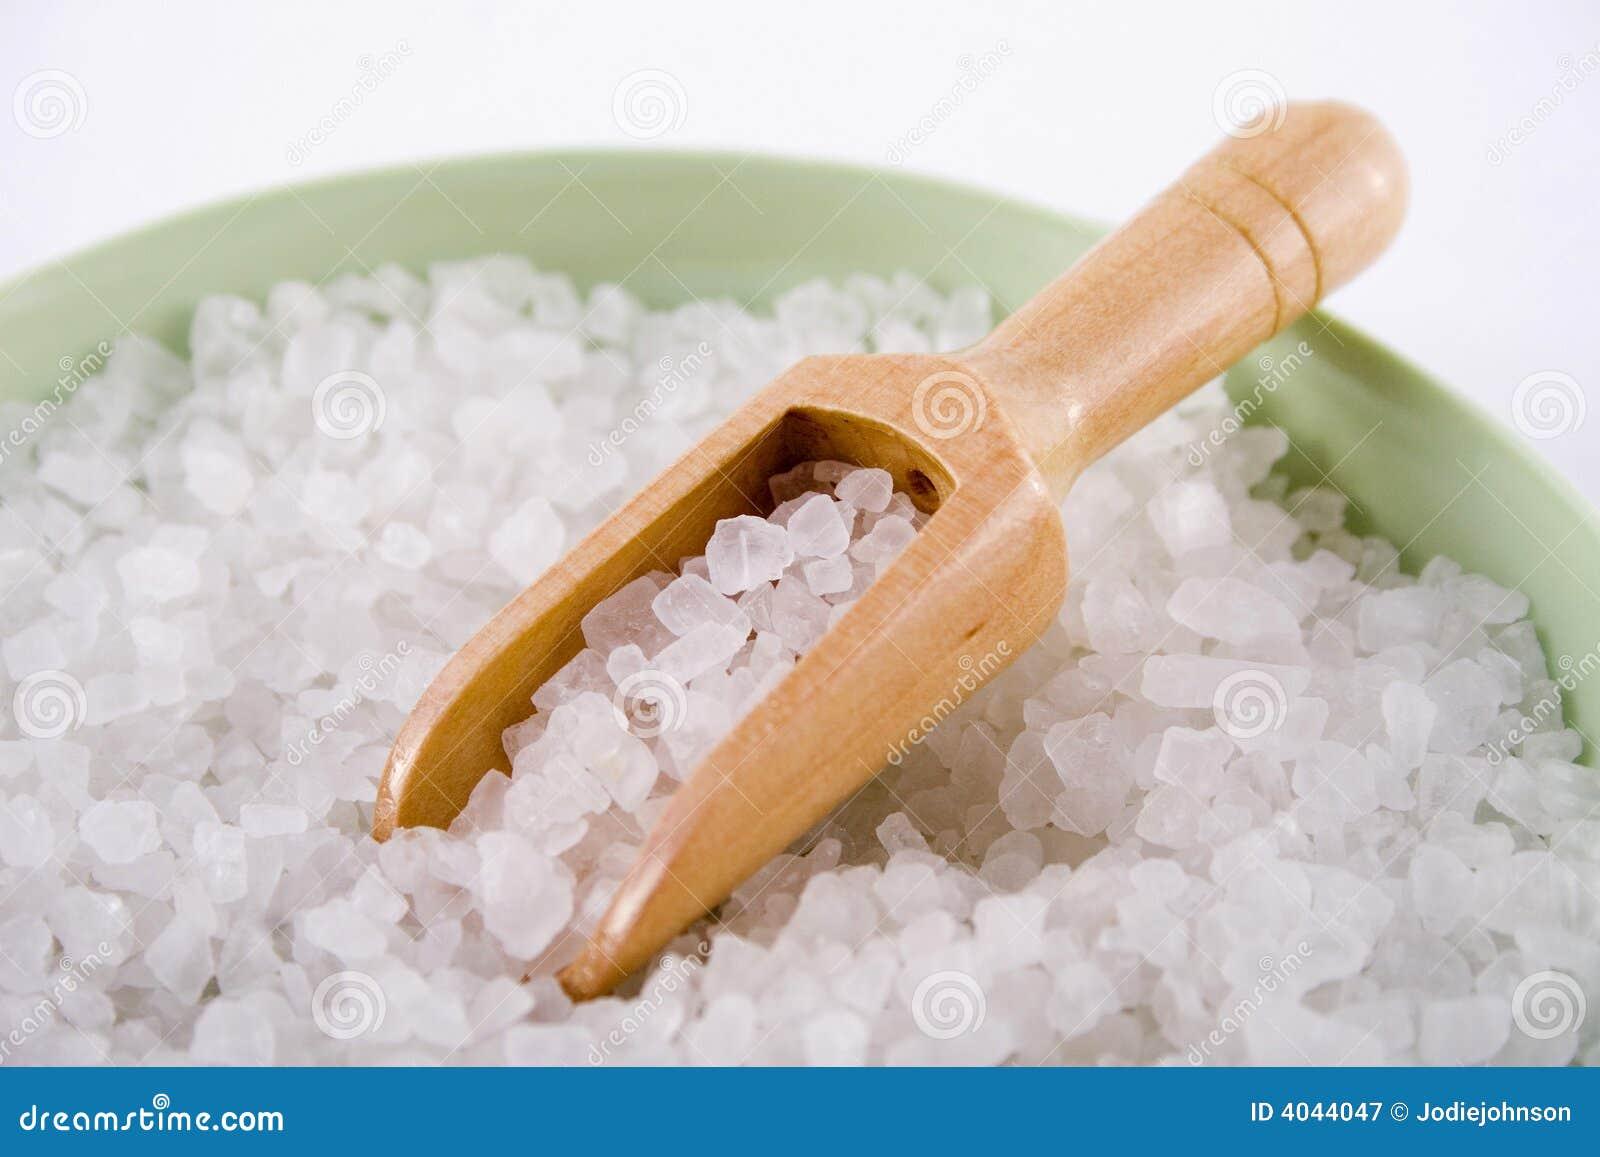 Spa bath salts